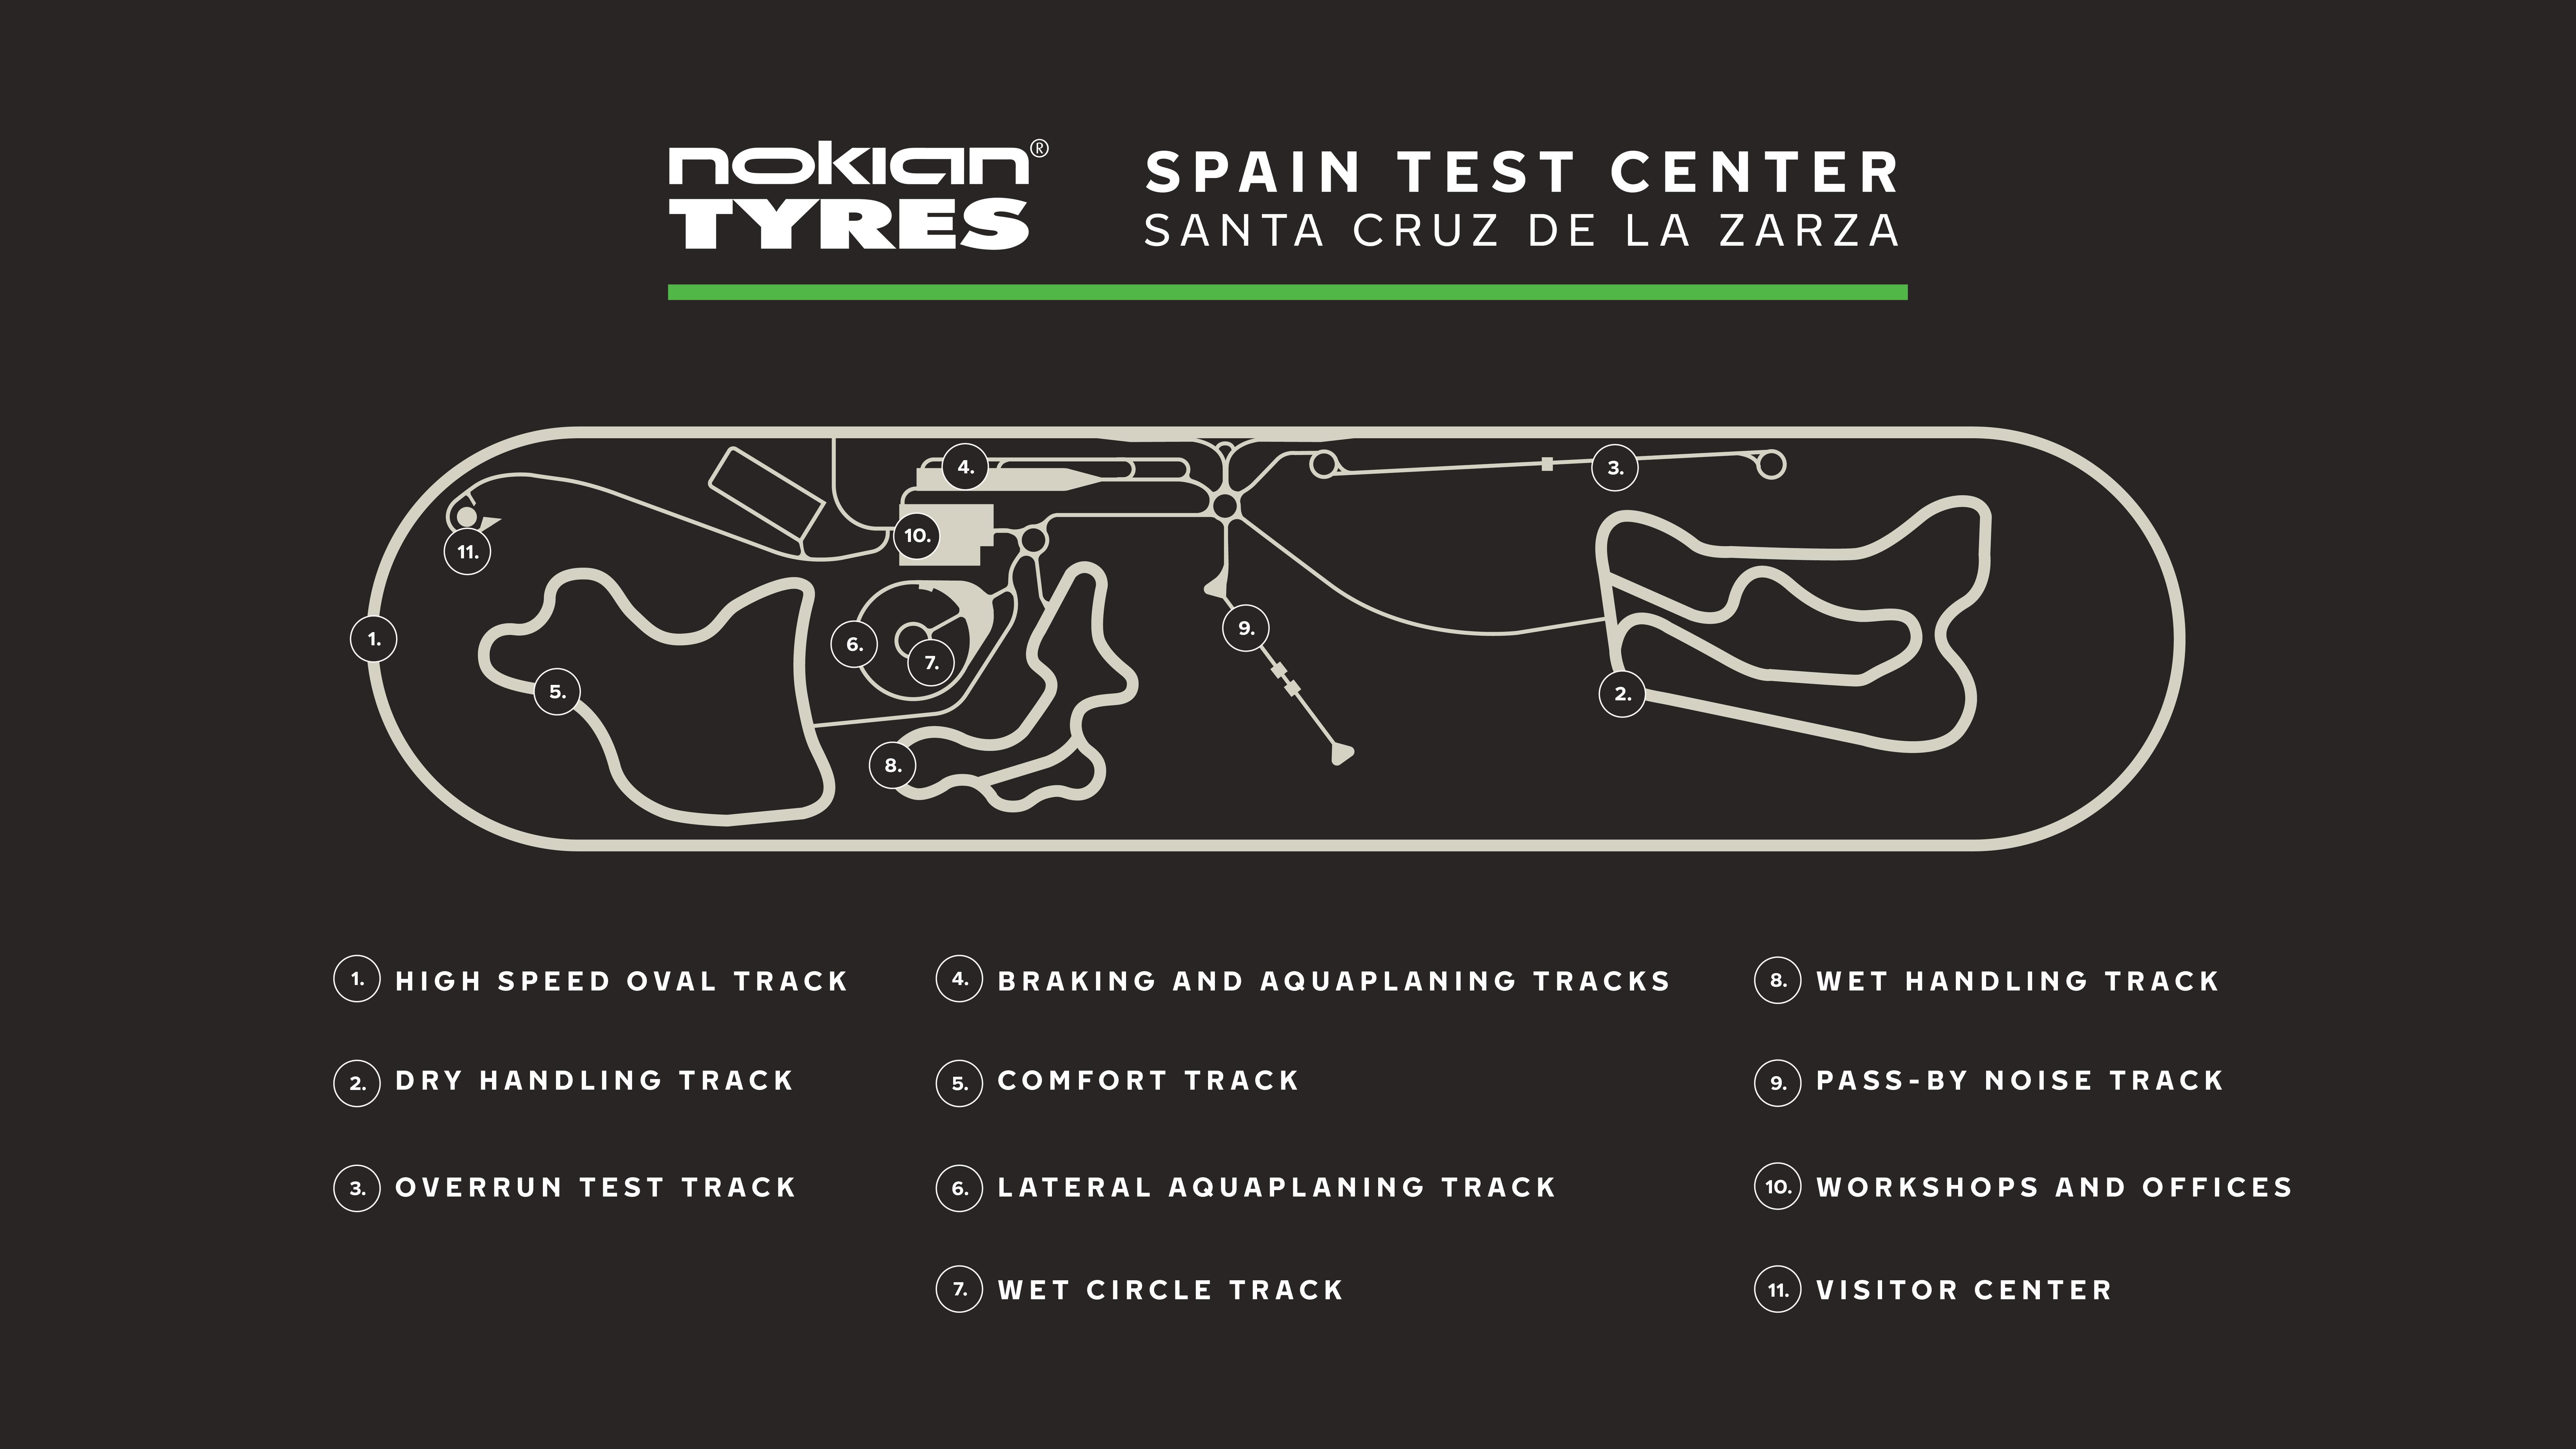 NT_Spain_Test_Center_Track_map_2021_EN